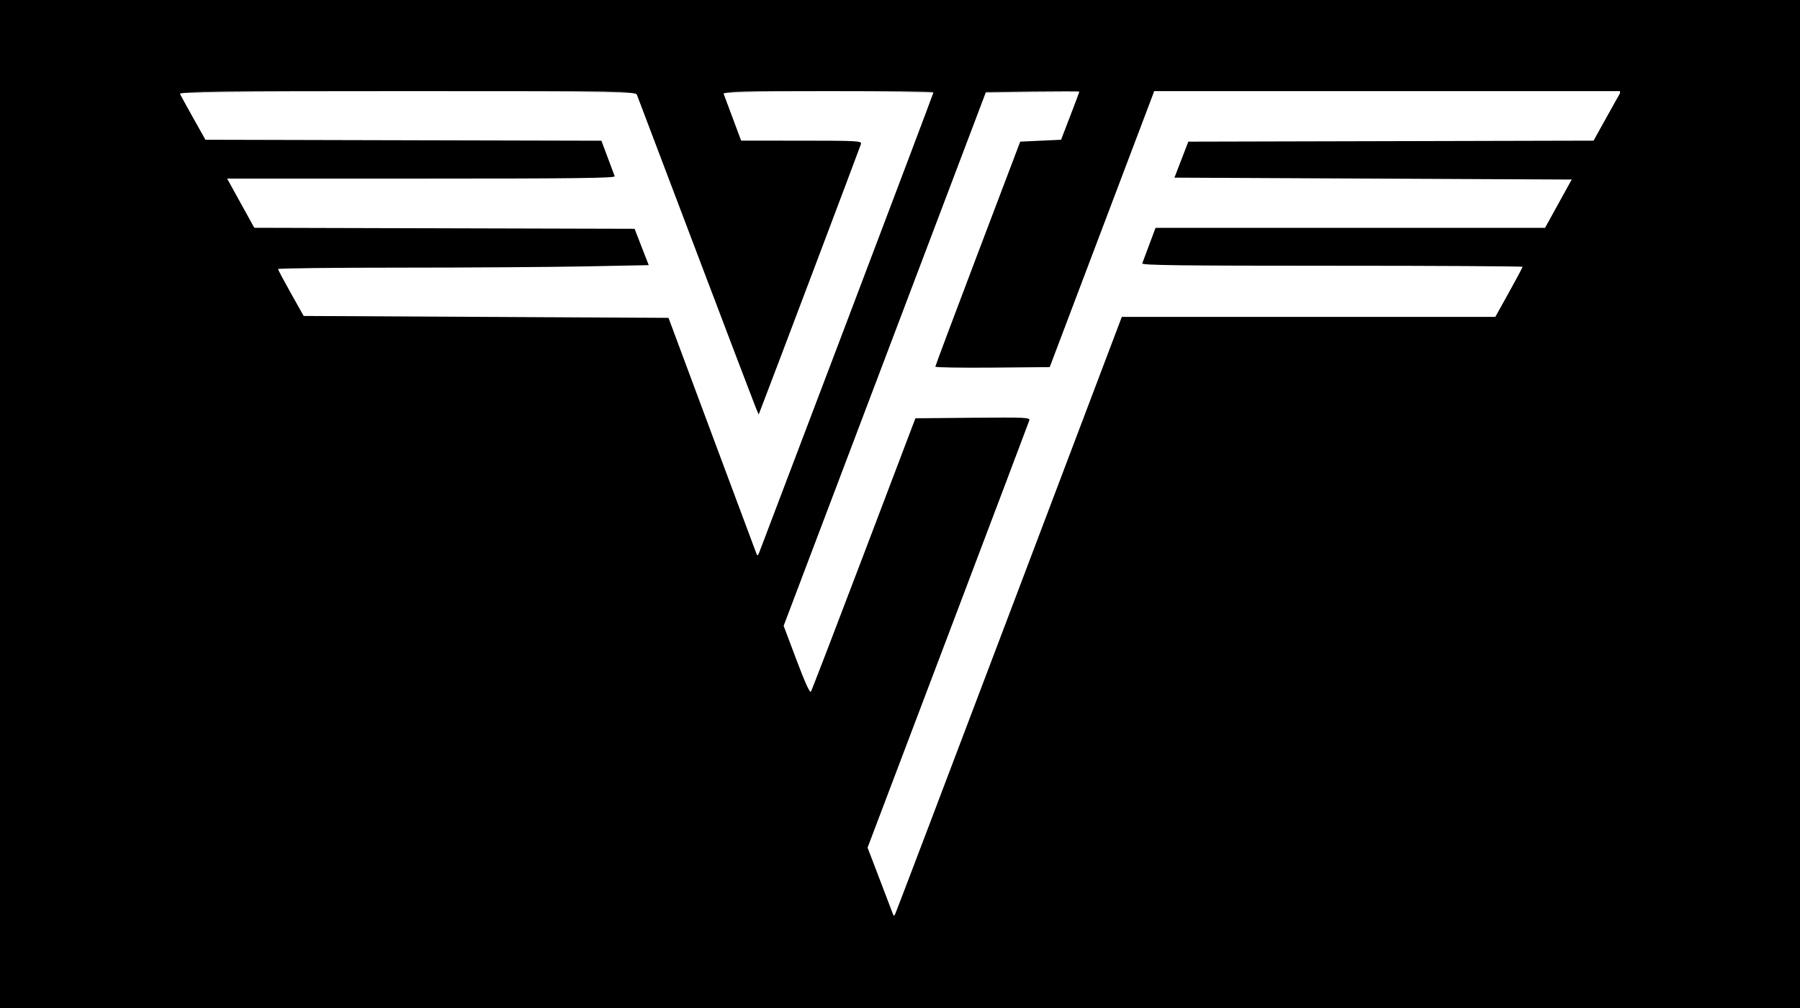 Meaning Van Halen logo and symbol.